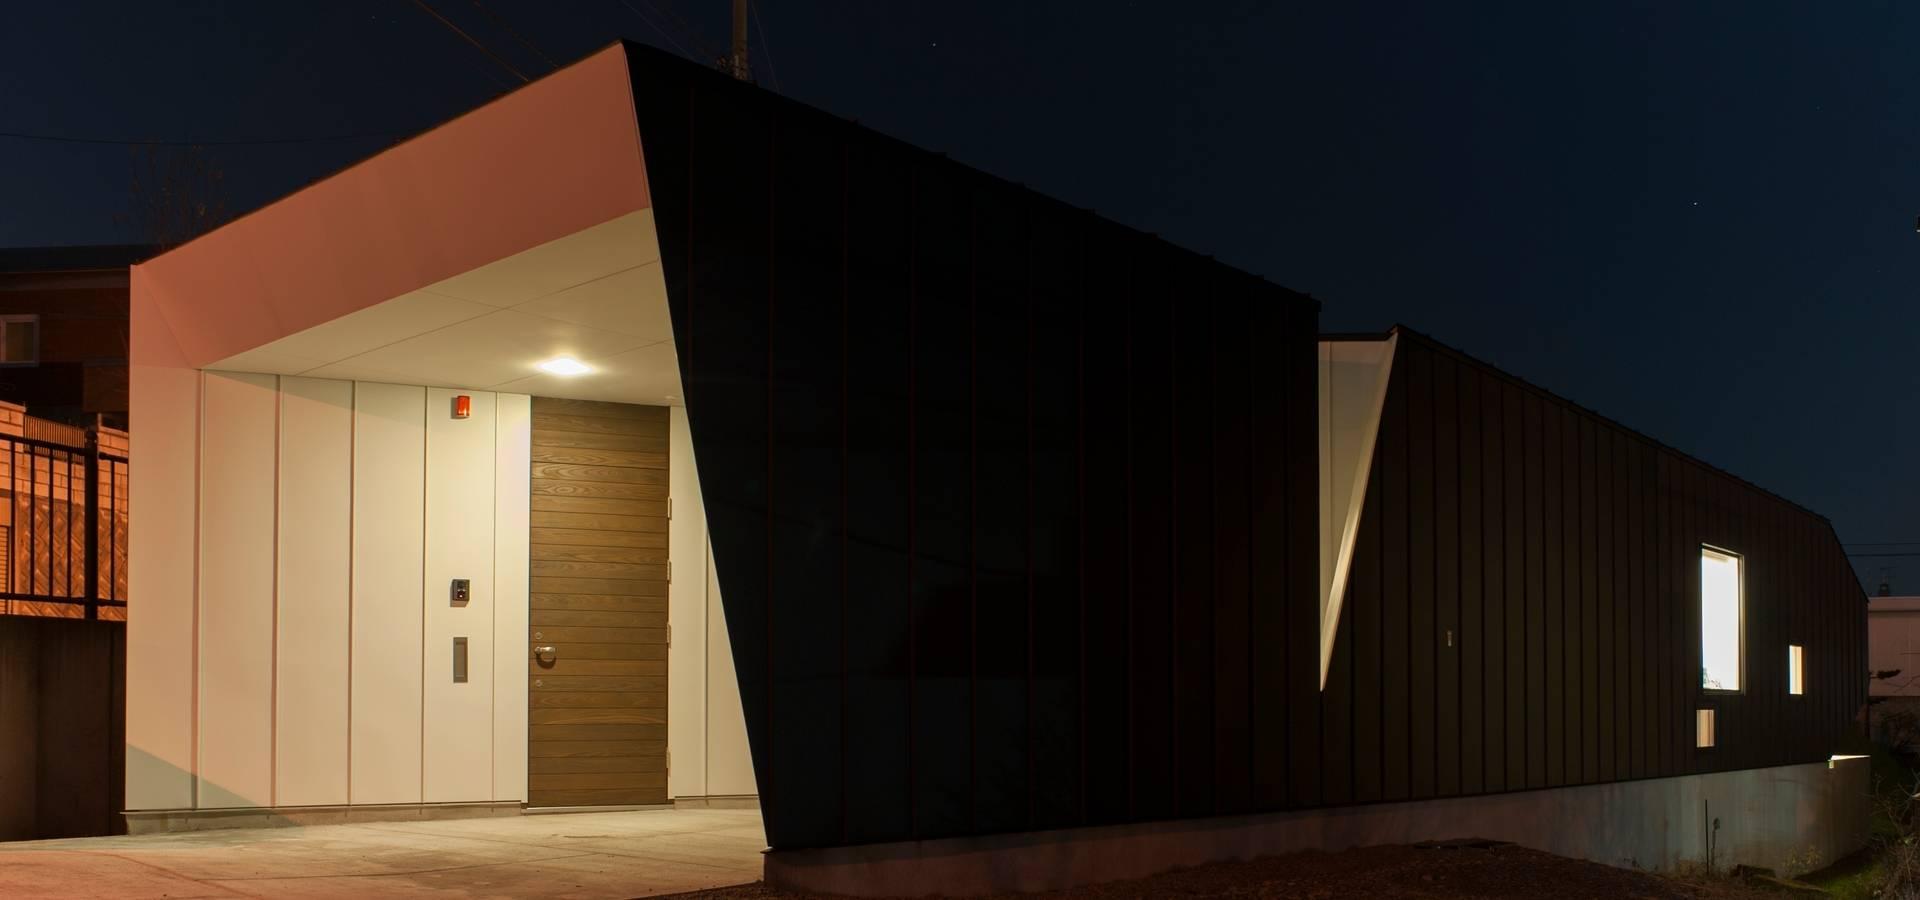 浅香建築設計事務所 asaka architectural design